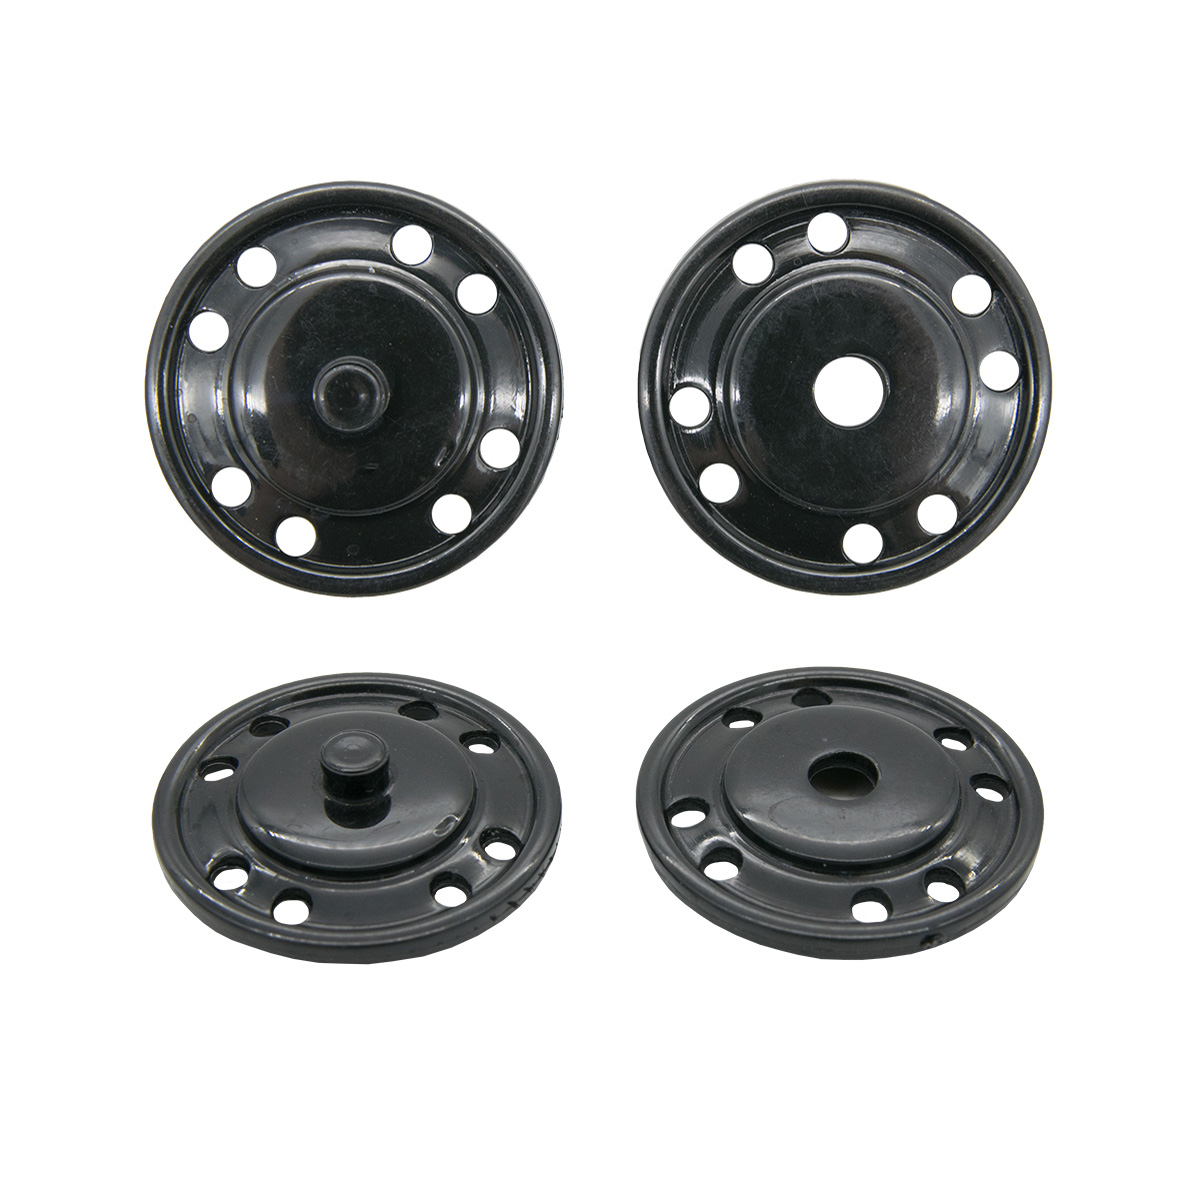 13-1329-14/BLACK-40 Кнопка пришивная д-23мм черн. пласт. ГР